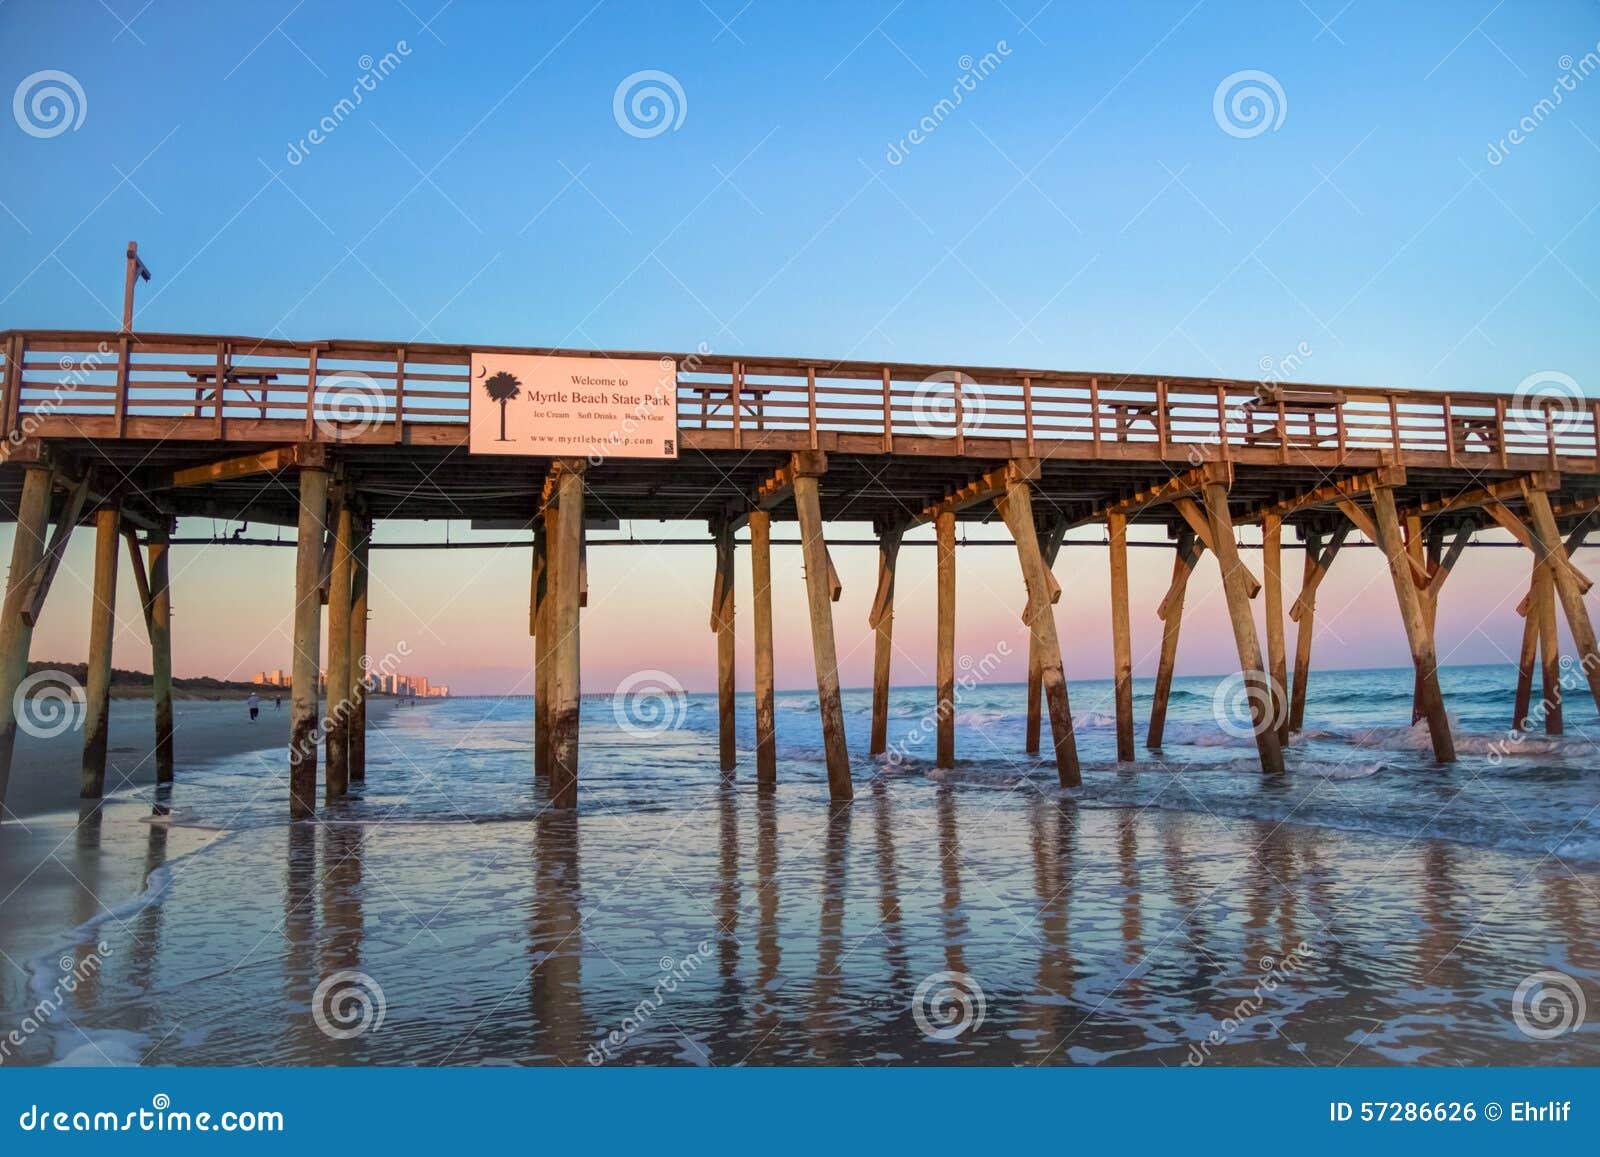 Boa vinda a Myrtle Beach